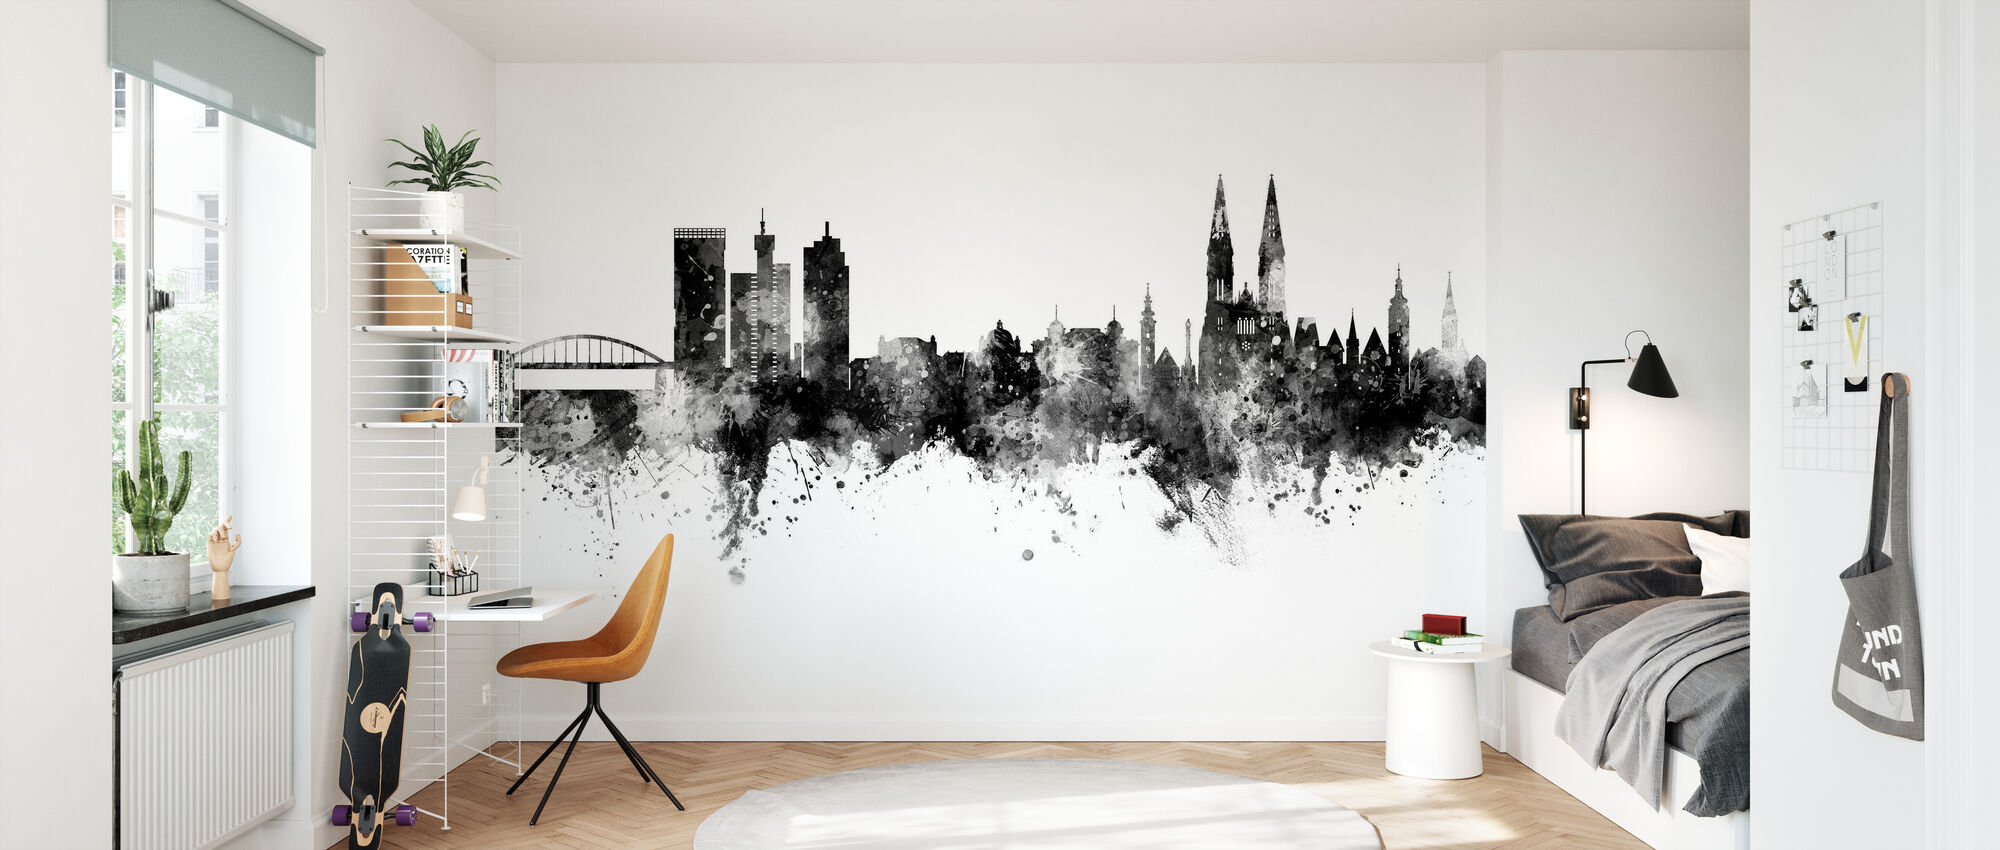 Zagreb Croatia Skyline - Wallpaper - Kids Room